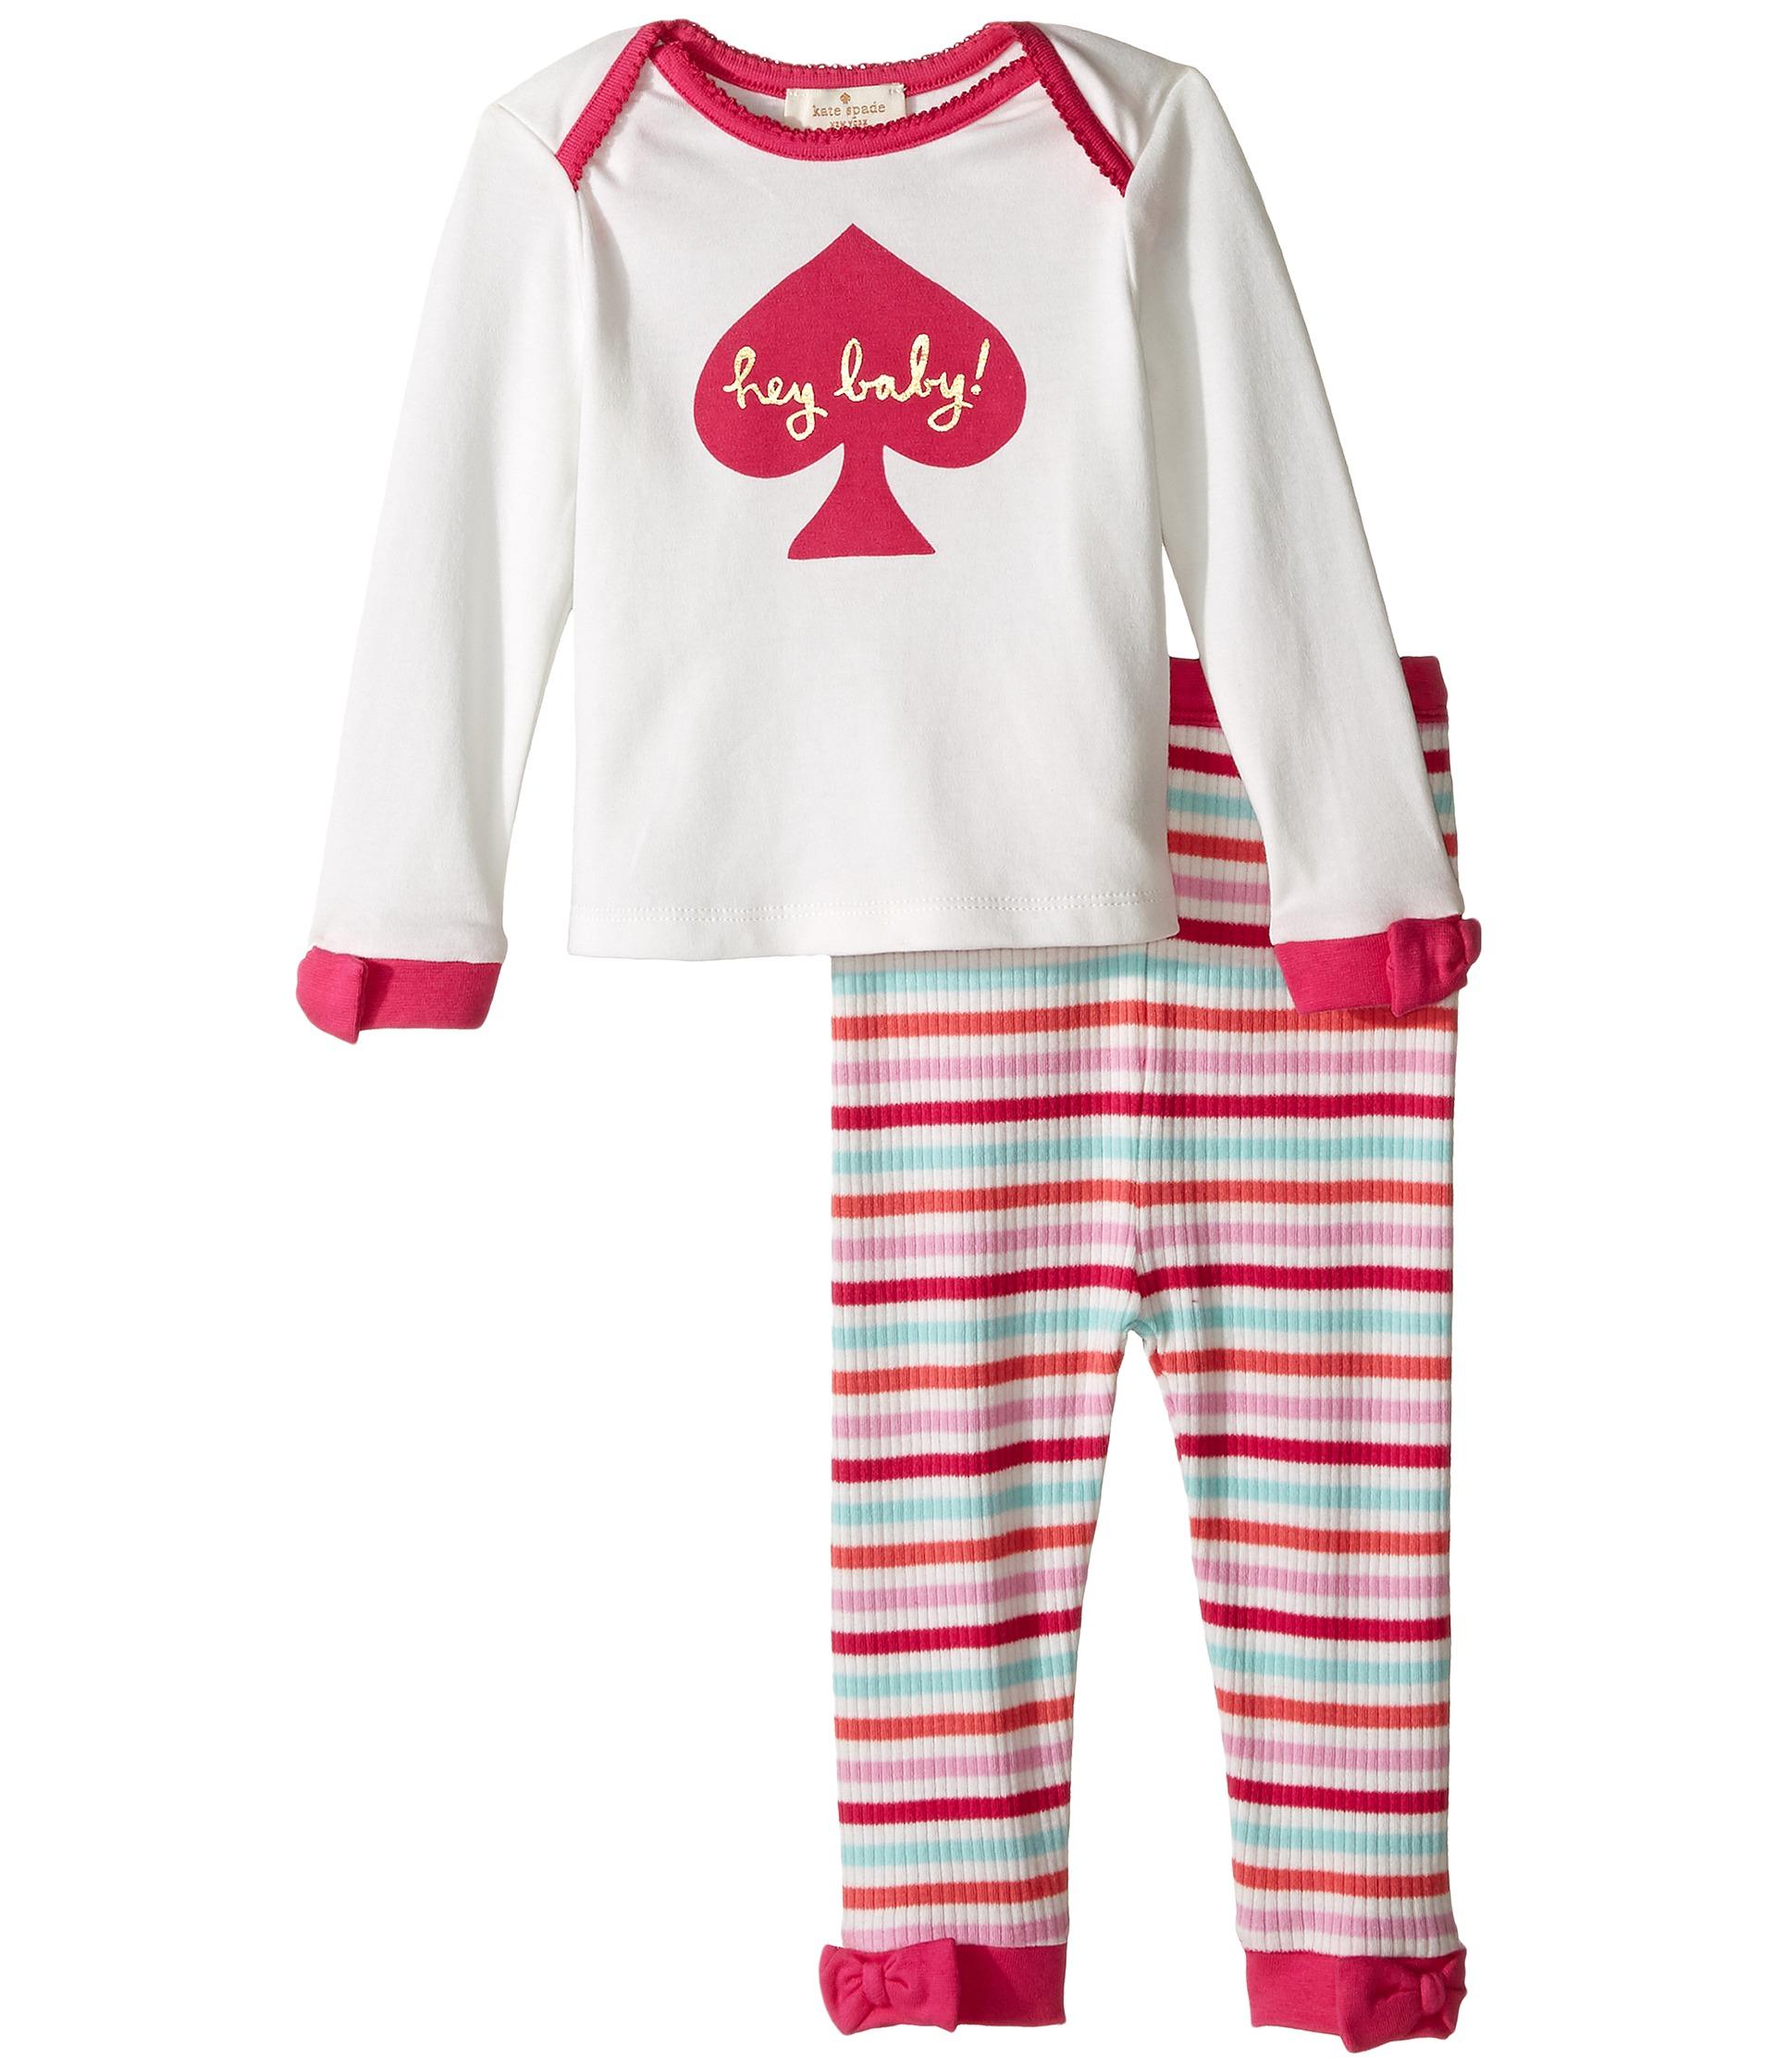 Kate Spade New York Kids Hey Baby Loungewear Set Infant